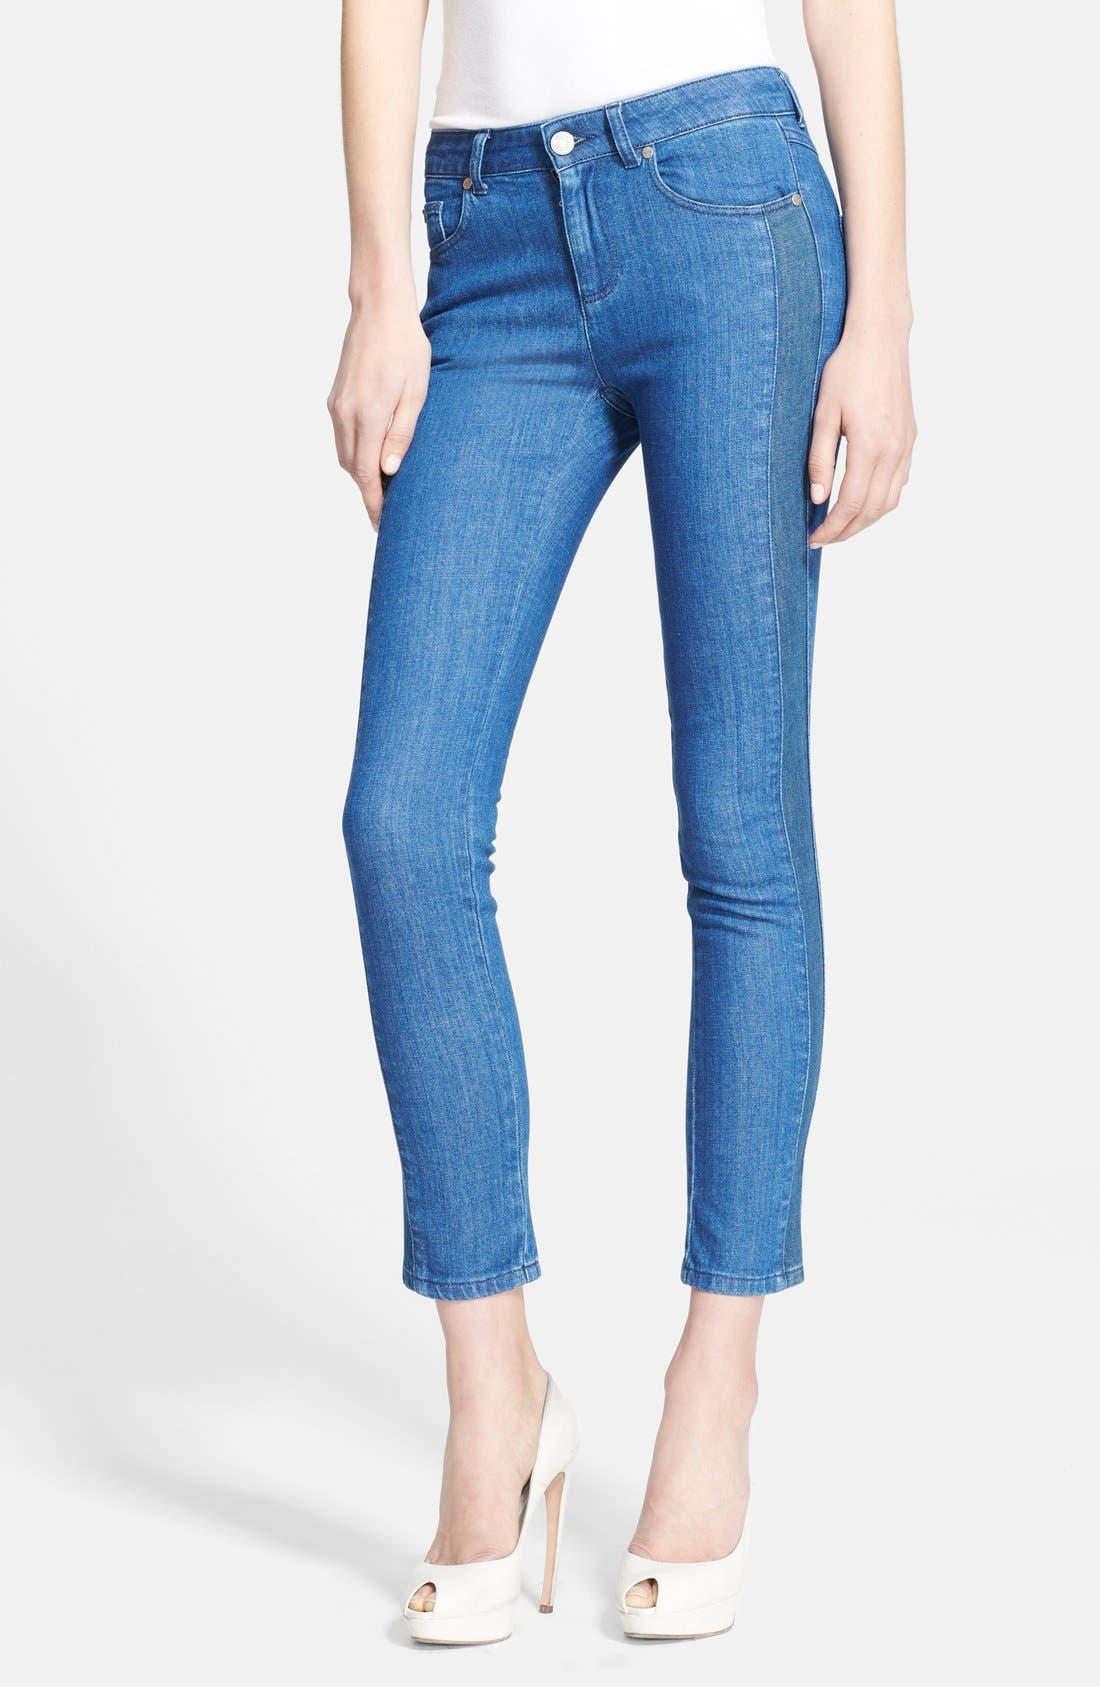 Alternate Image 1 Selected - Alexander McQueen Tuxedo Stripe Crop Skinny Jeans